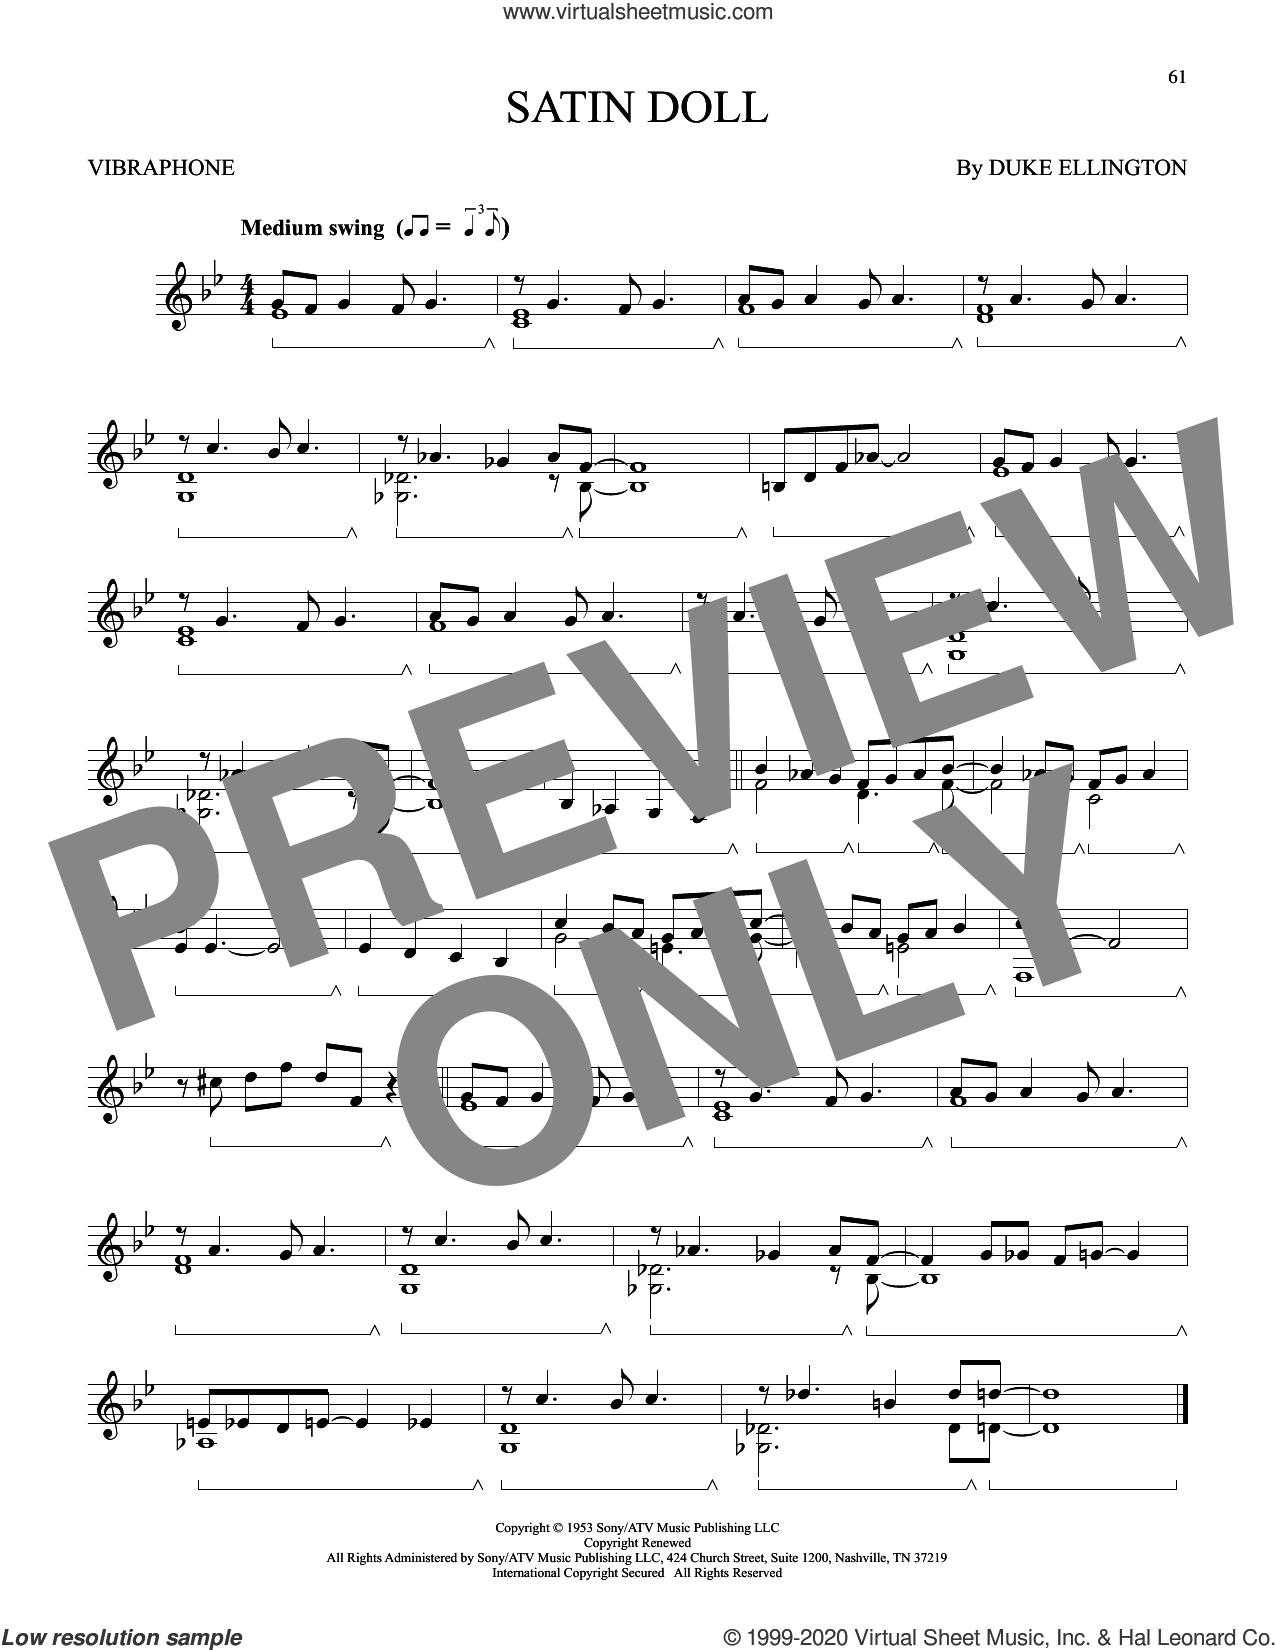 Satin Doll sheet music for Vibraphone Solo by Duke Ellington, Billy Strayhorn and Johnny Mercer, intermediate skill level